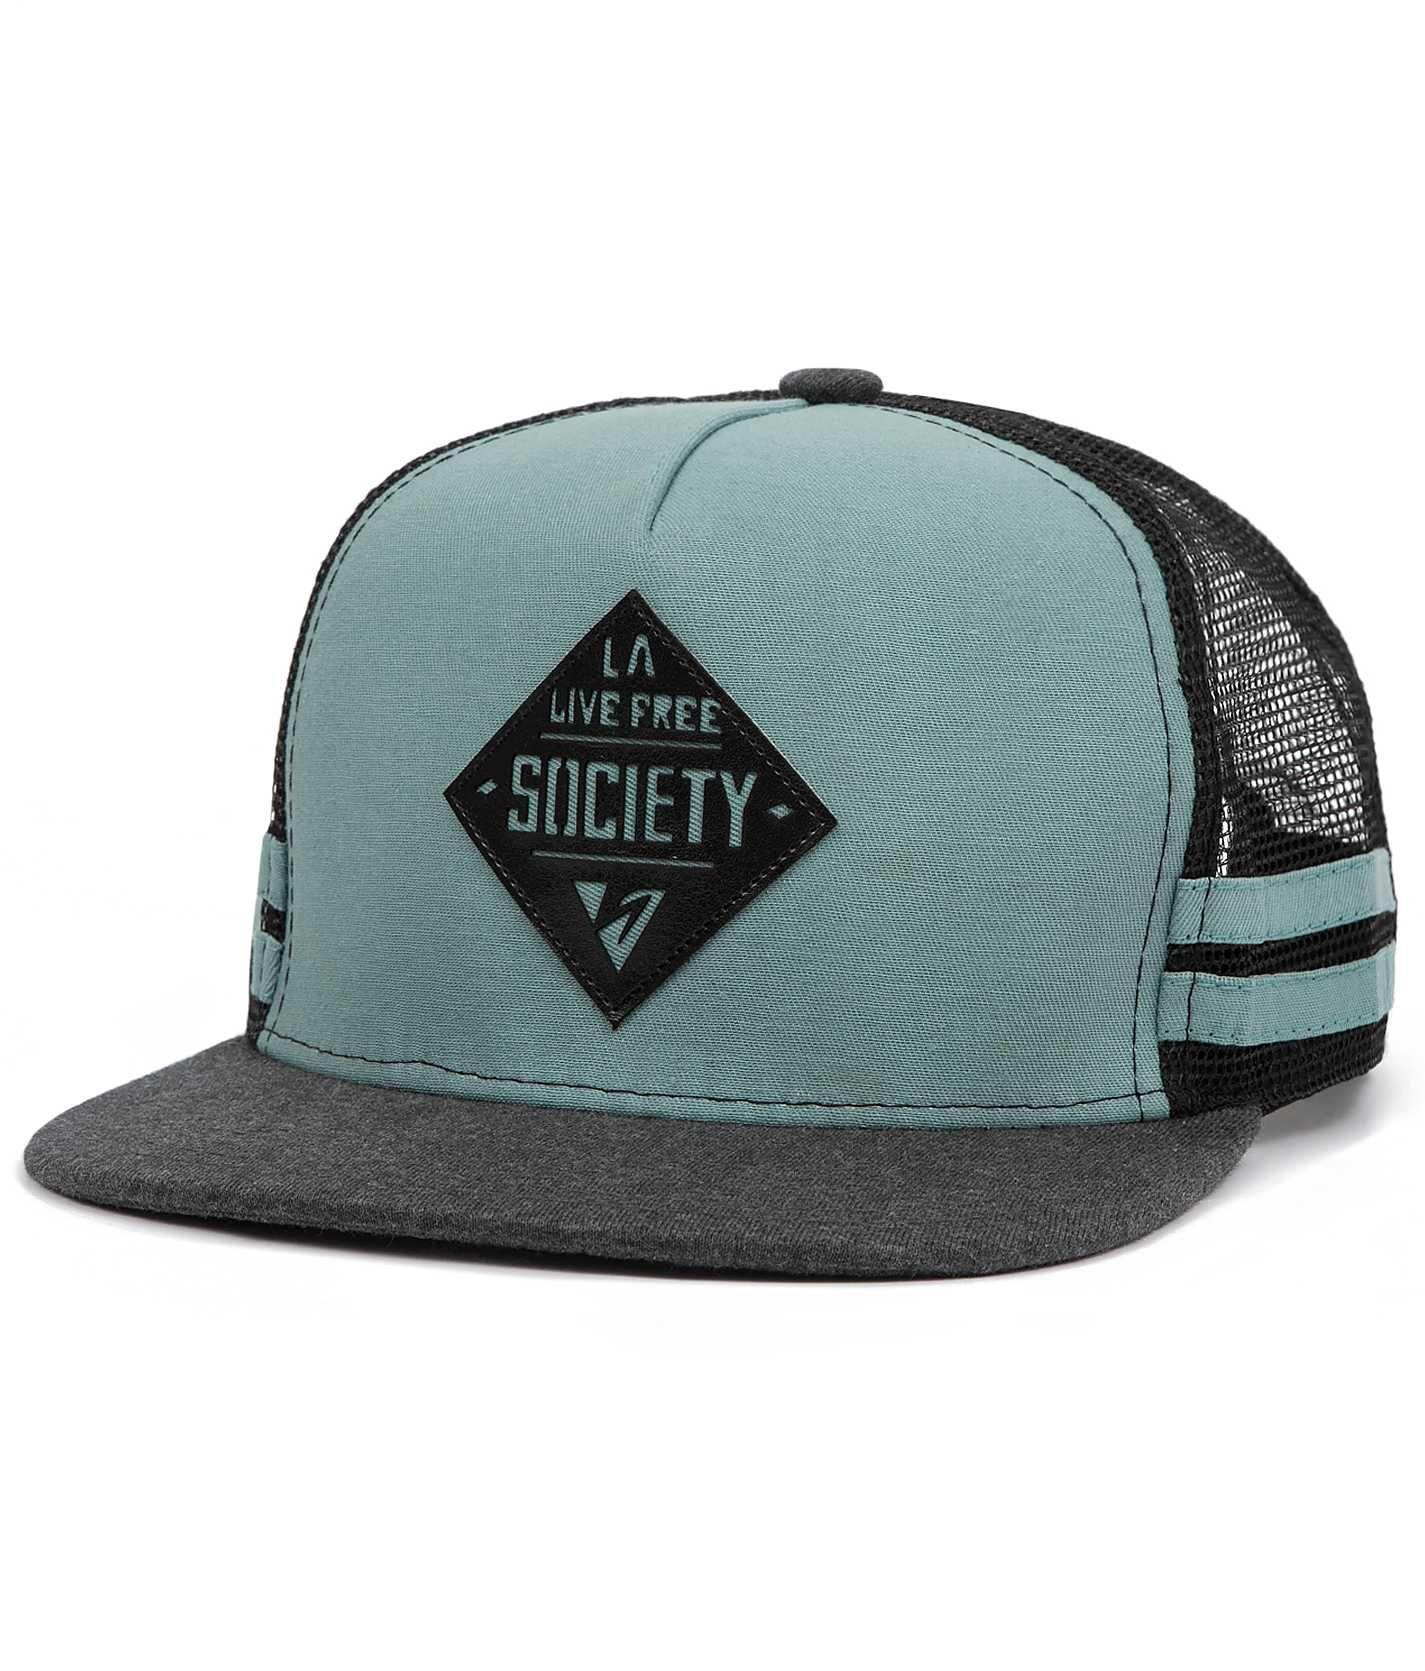 a76f3e68935 Society Develop Trucker Hat - Men s Hats